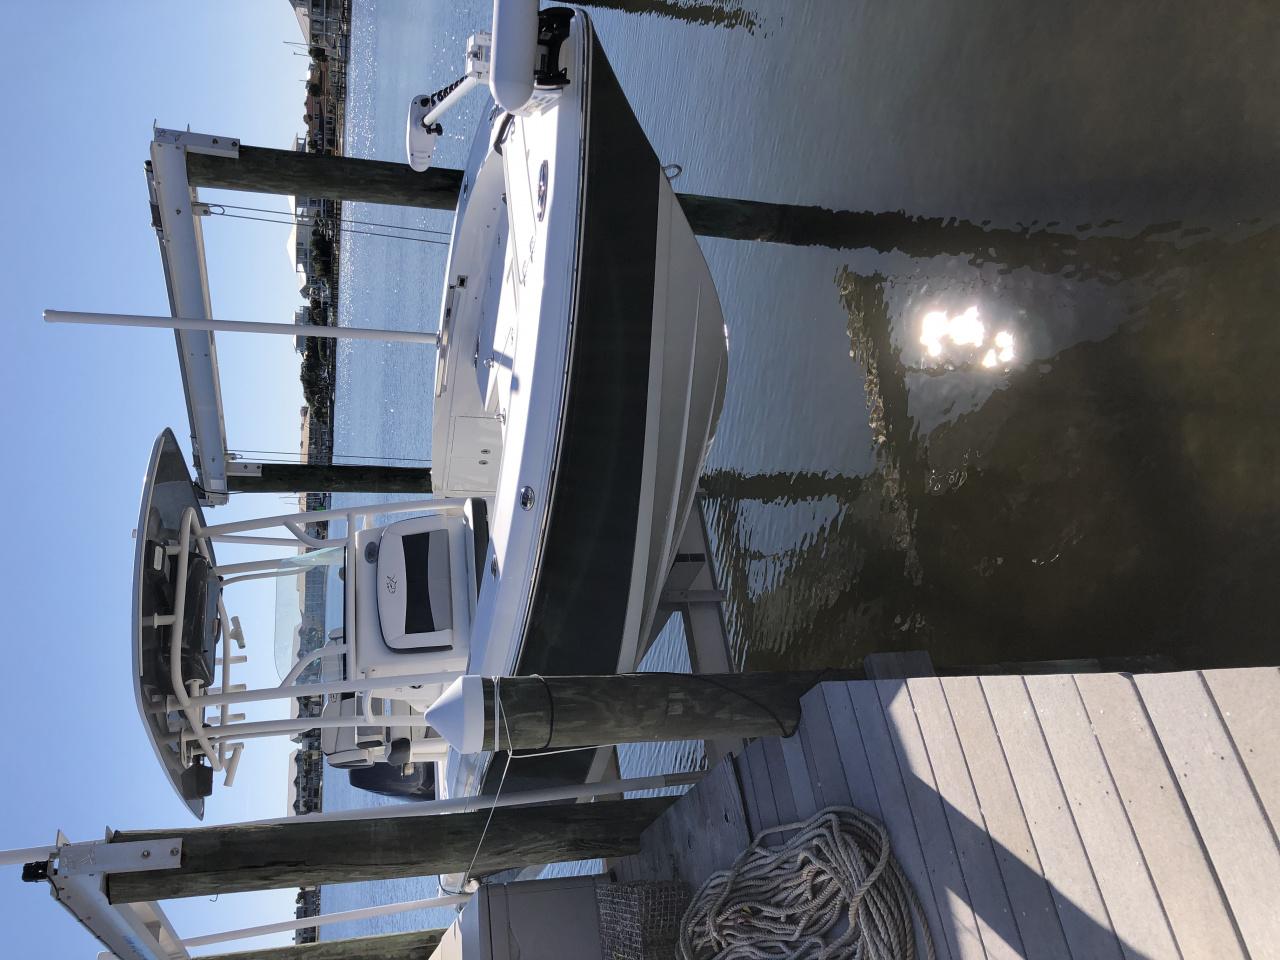 2016 26' Cravalle Bay boat-img_1257-jpg